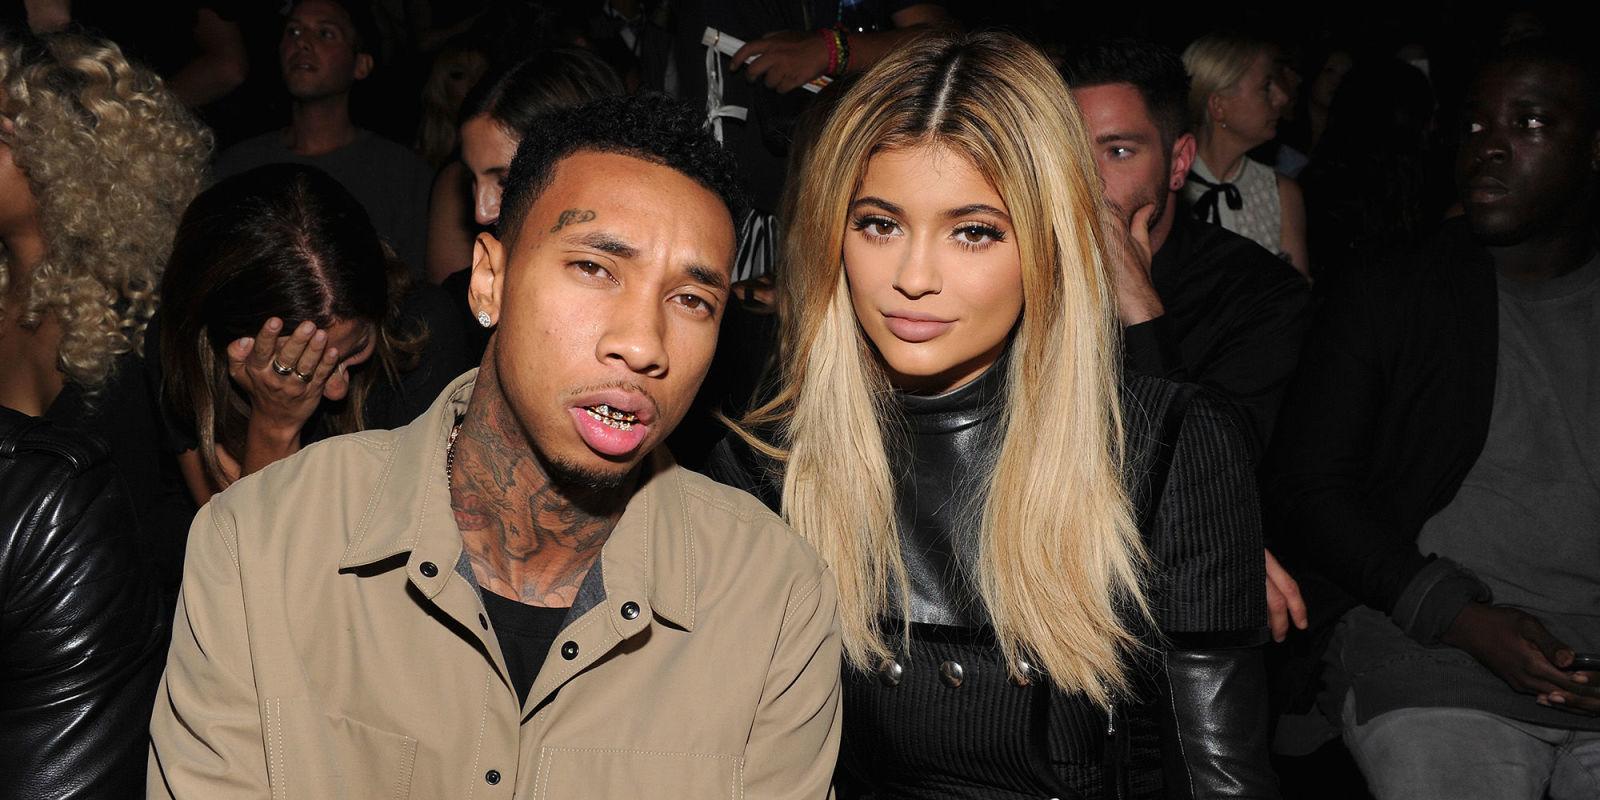 Kylie Jenner Finally Breaks Silence On Her Break-Up With Tyga